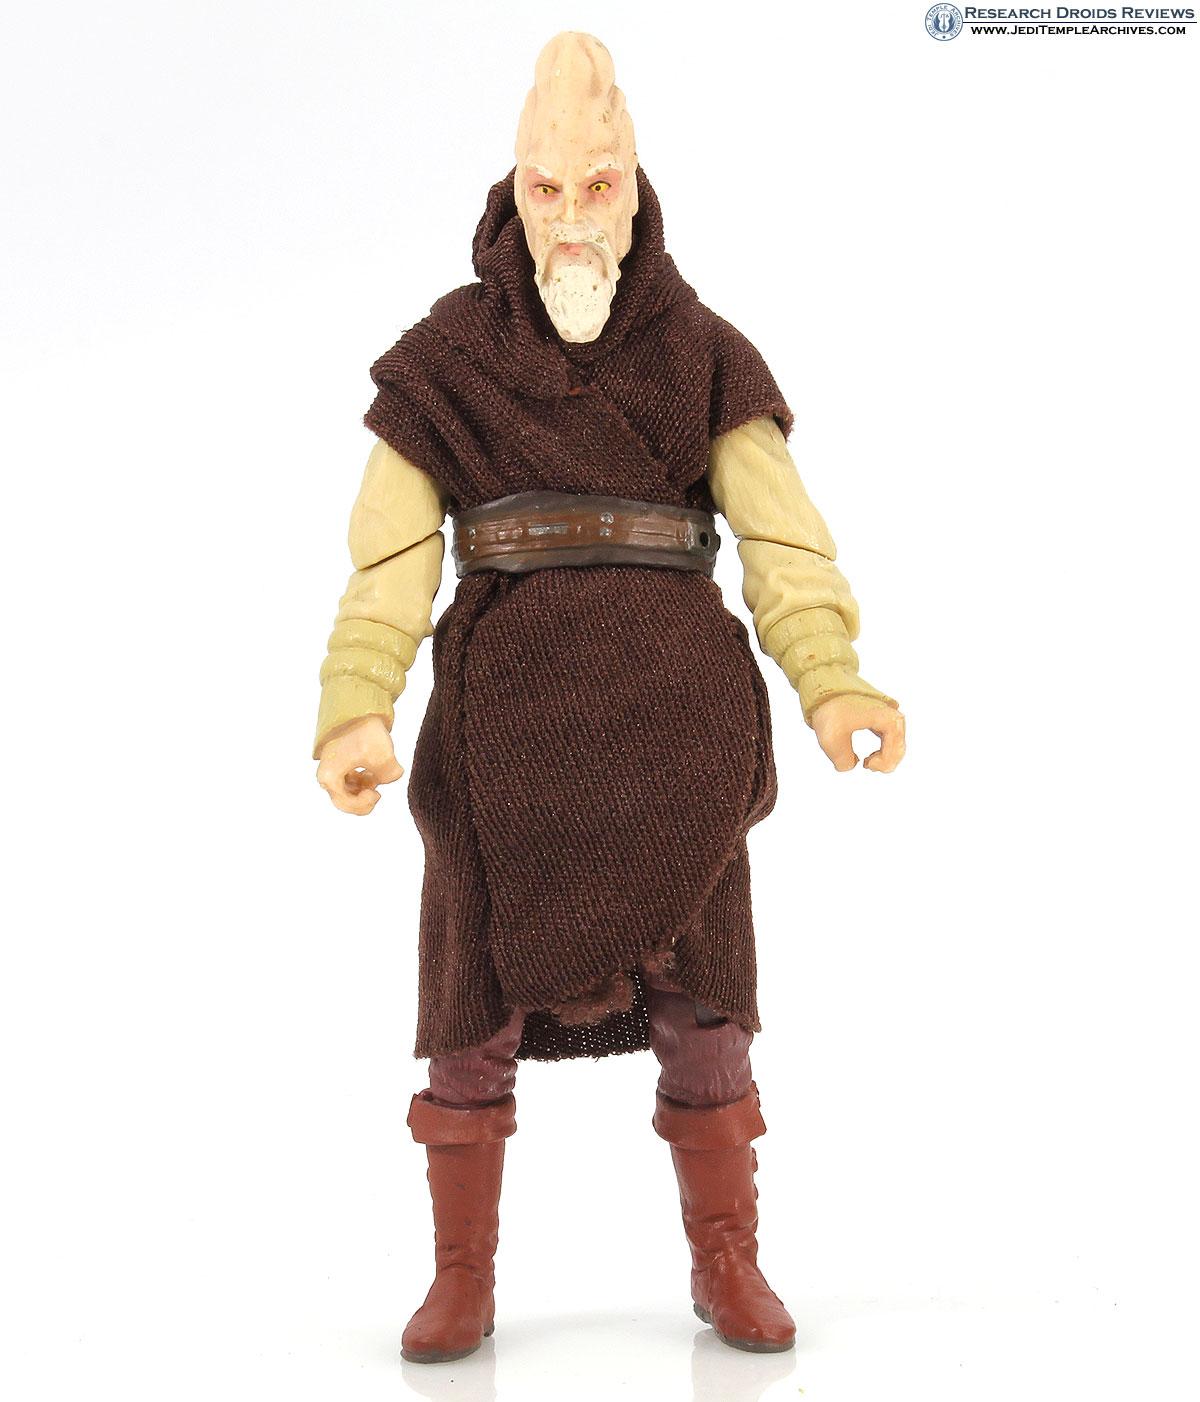 Ki Adi Mundi (Jedi Master)